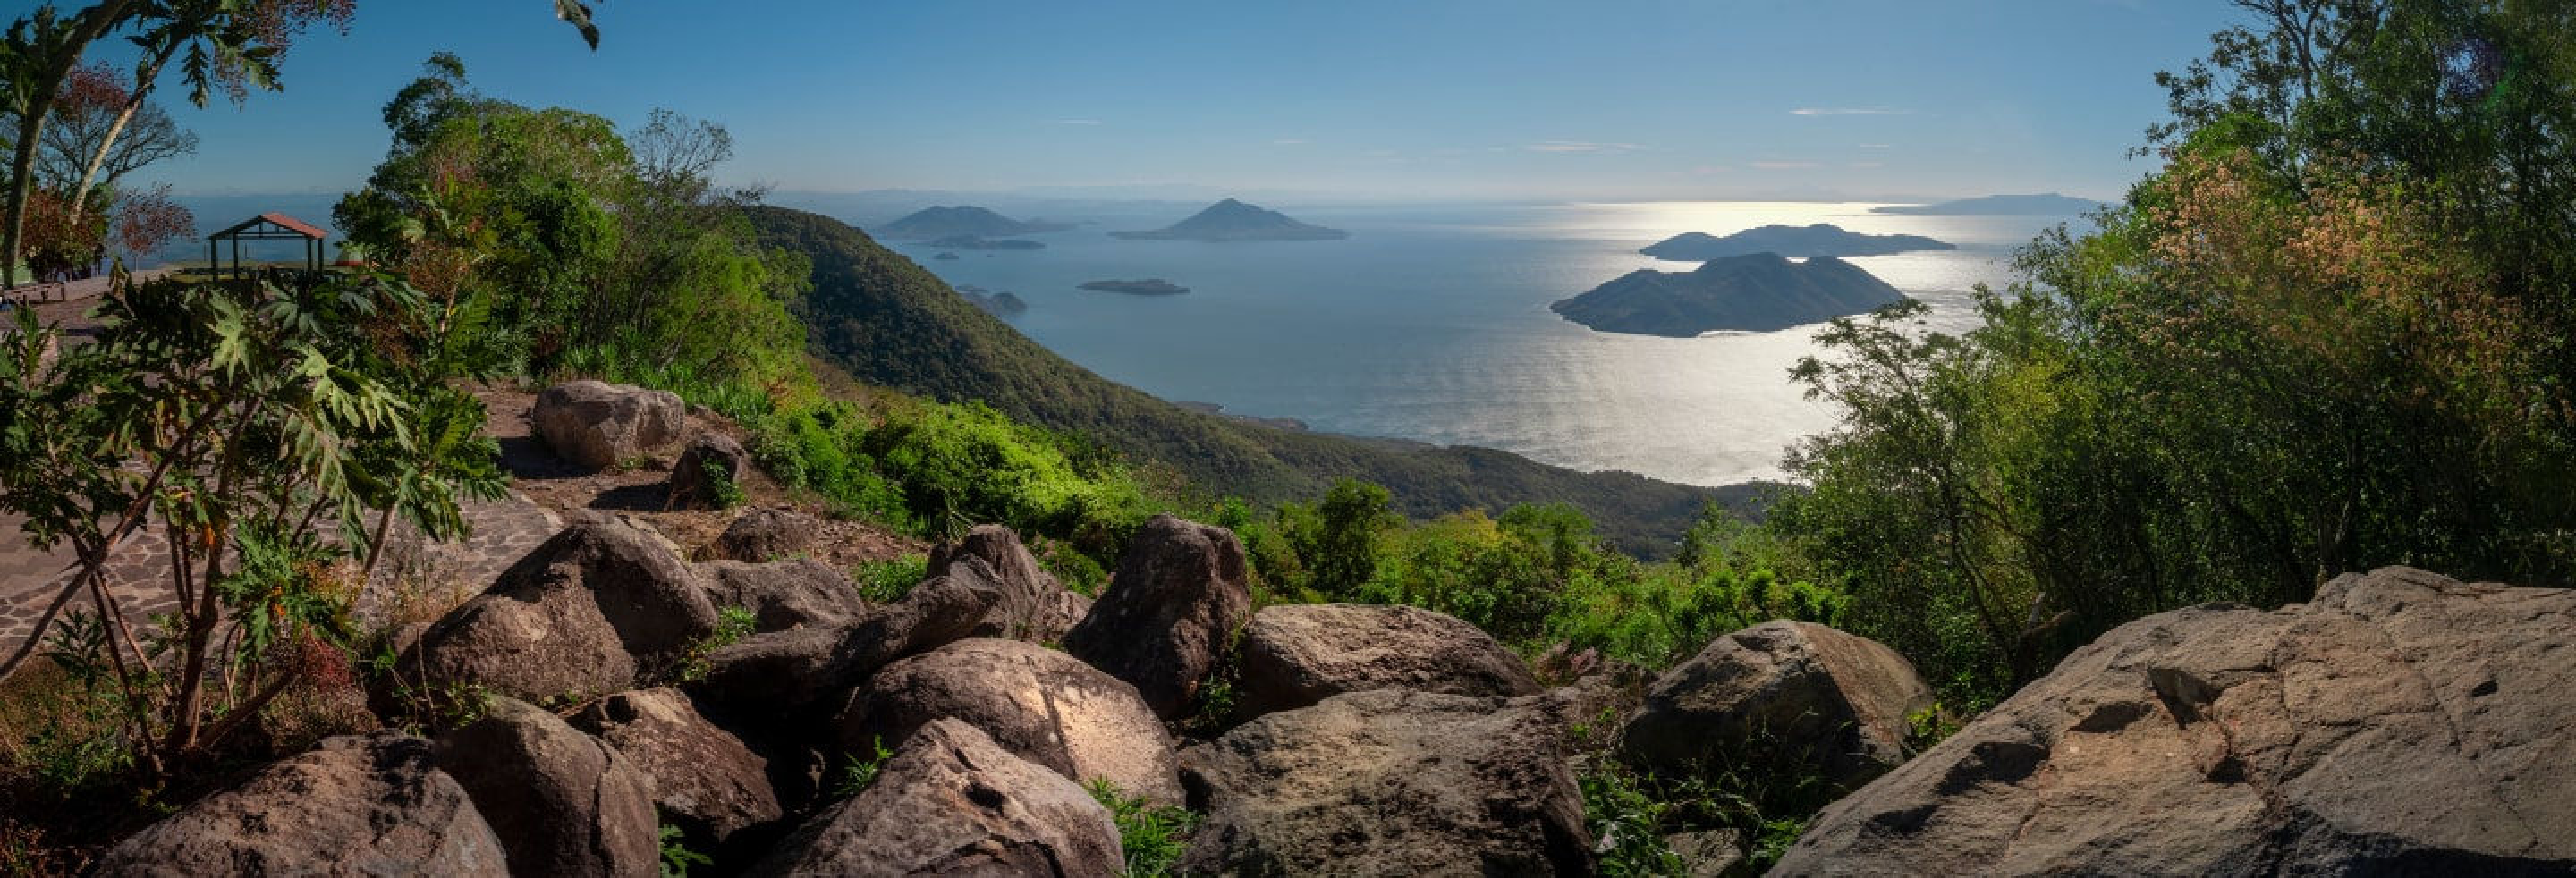 Tour de 2 días por el Golfo de Fonseca